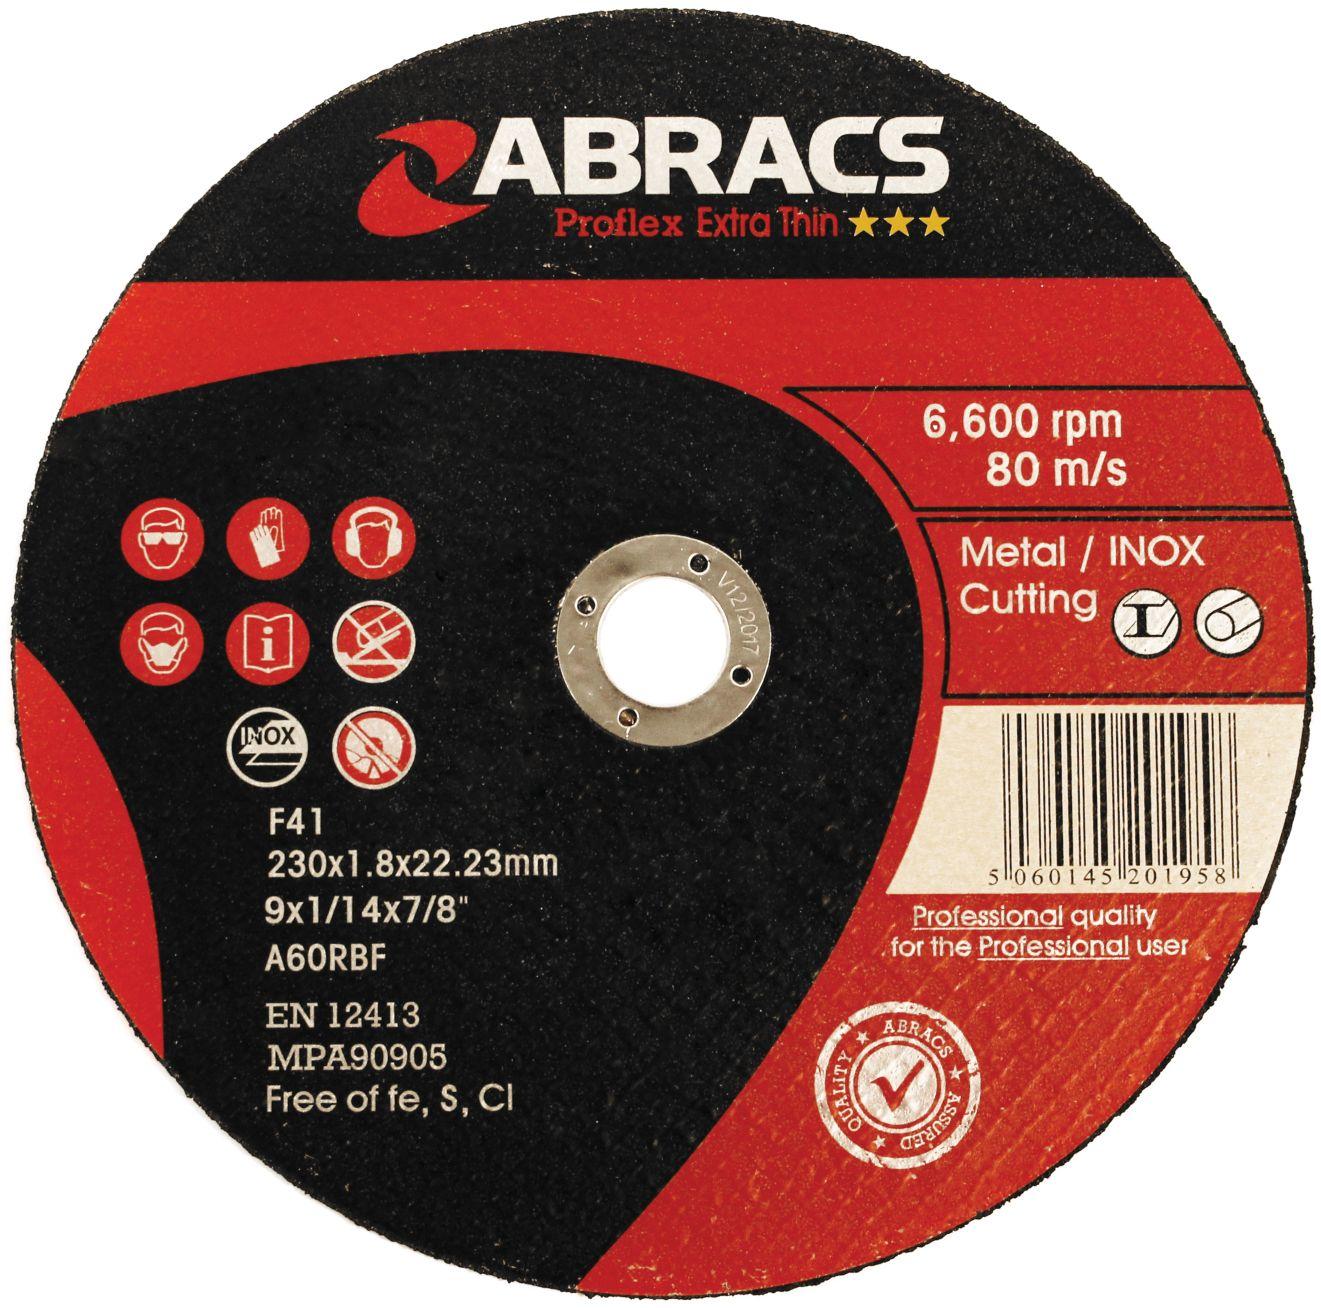 THIN METAL CUTTING DISC - FLAT 100 X 1.0 X 16MM